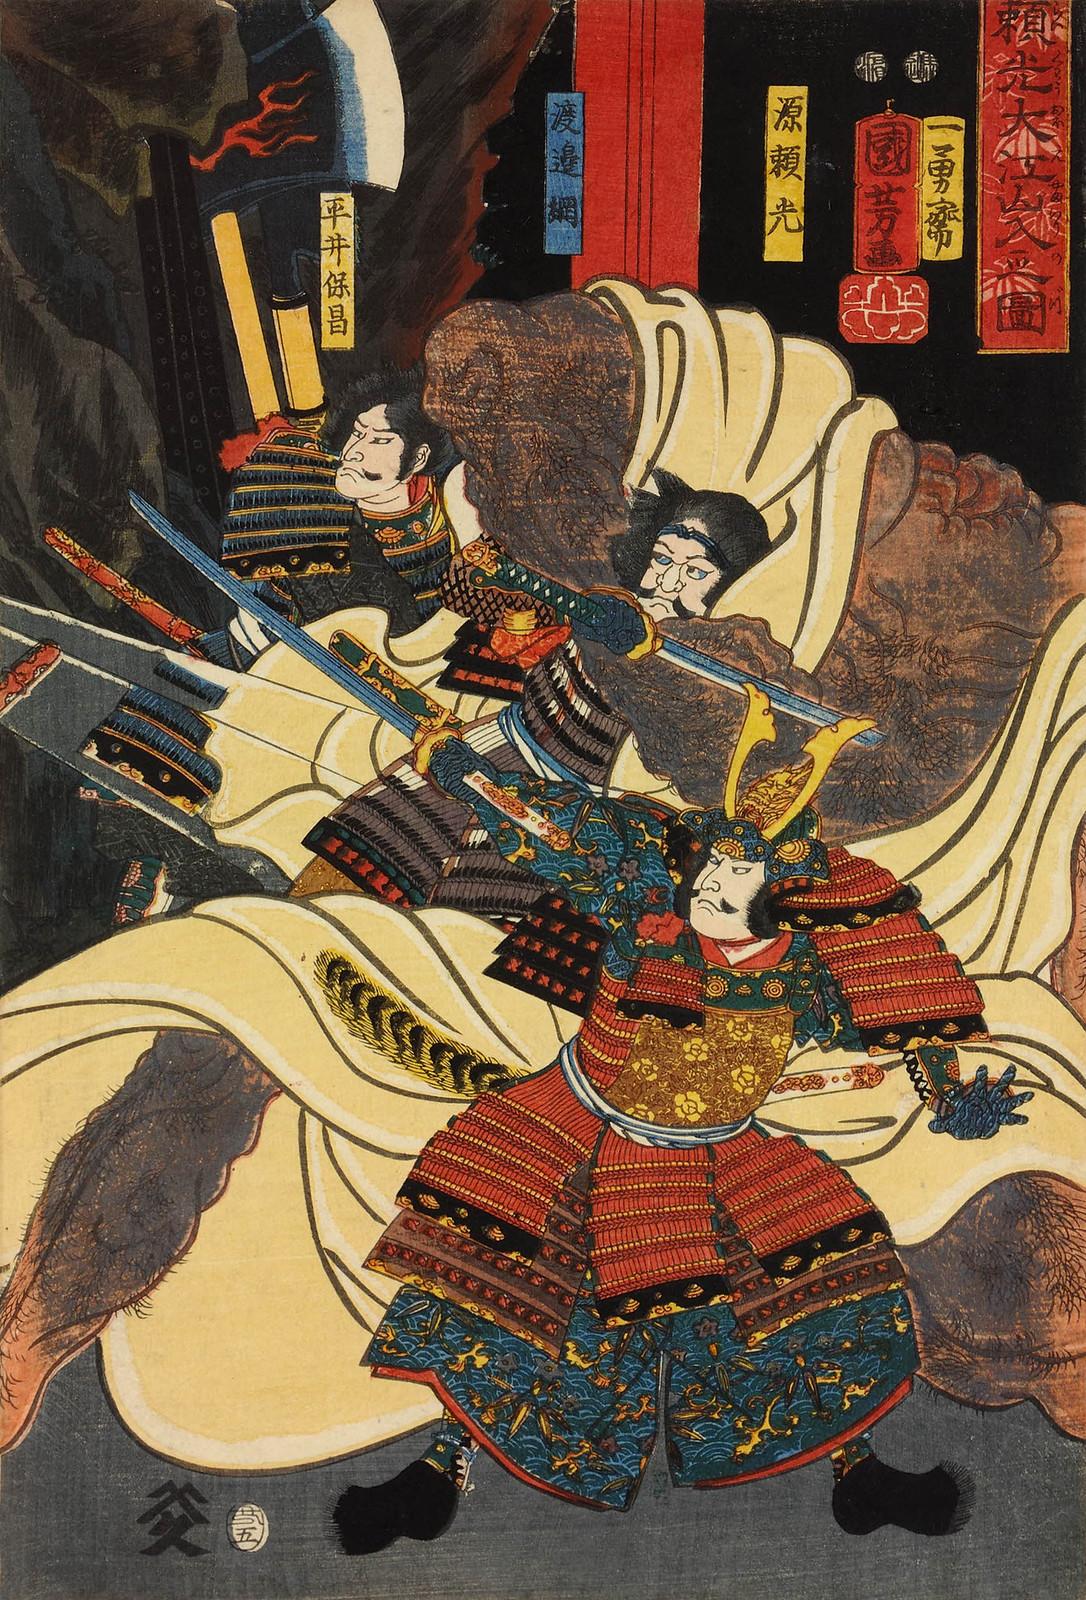 Utagawa Kuniyoshi - Raiko Oeyama iri no zu, 1853 (right panel)